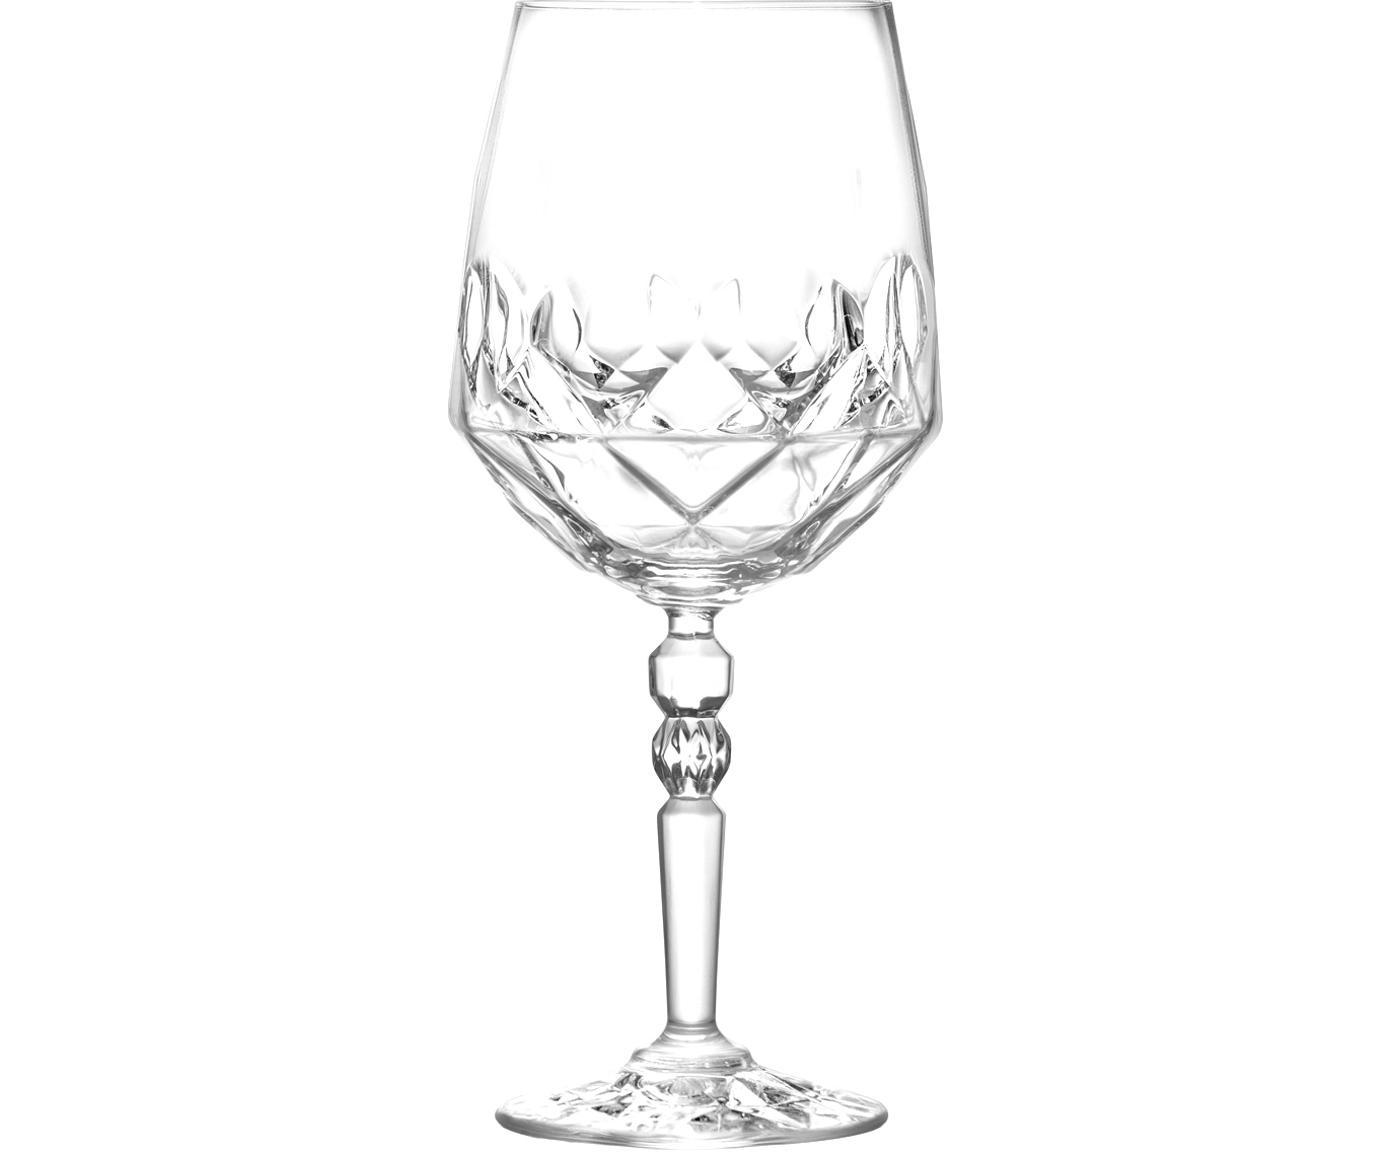 Copas de vino blanco de cristal Calicia, 6uds., Cristal, Transparente, Ø 10 x Al 23 cm